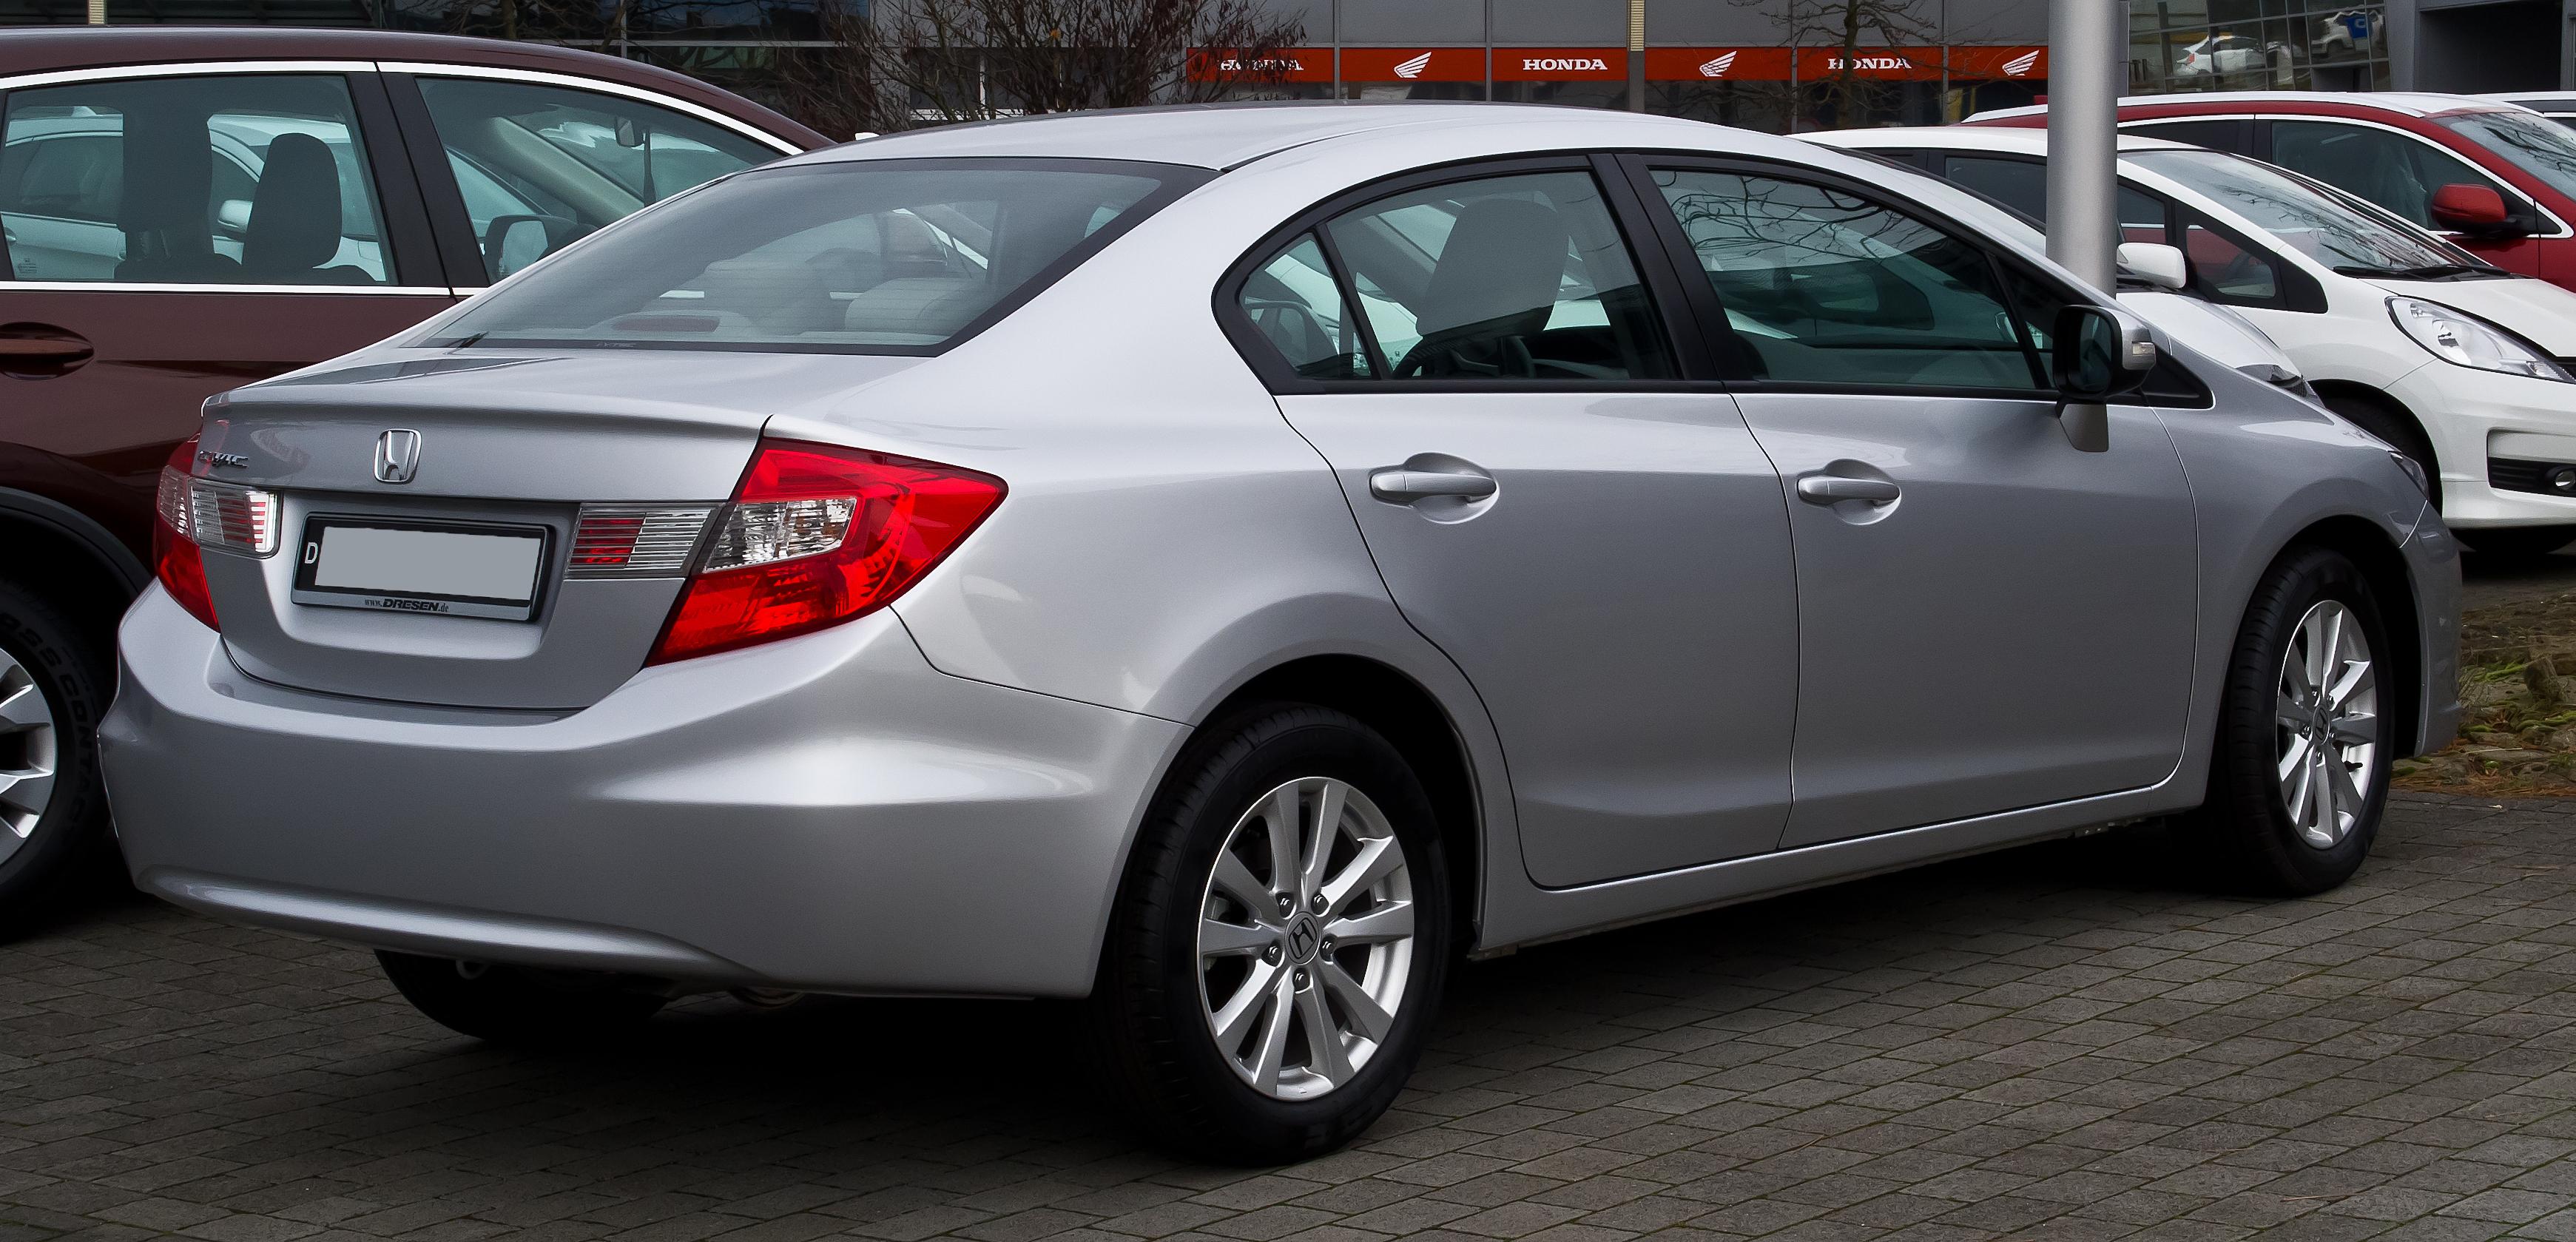 File:Honda Civic Stufenheck 1.8 i-VTEC Comfort (IX) – Heckansicht ...